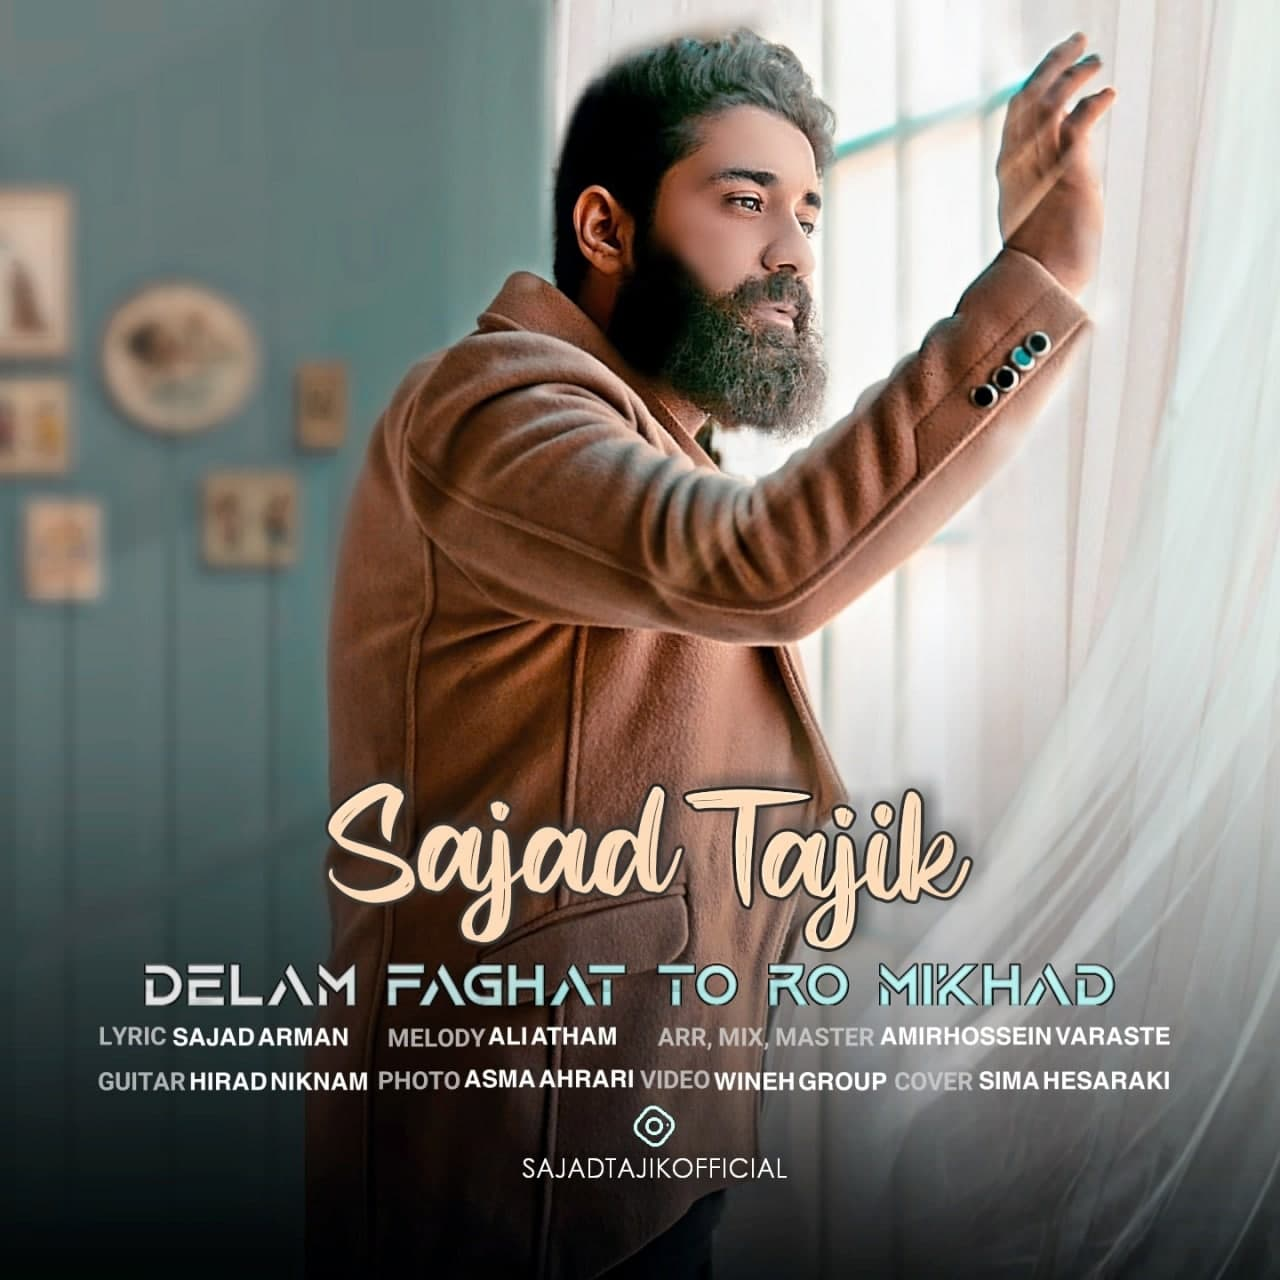 Sajad Tajik – Delam Faghat To Ro Mikhad